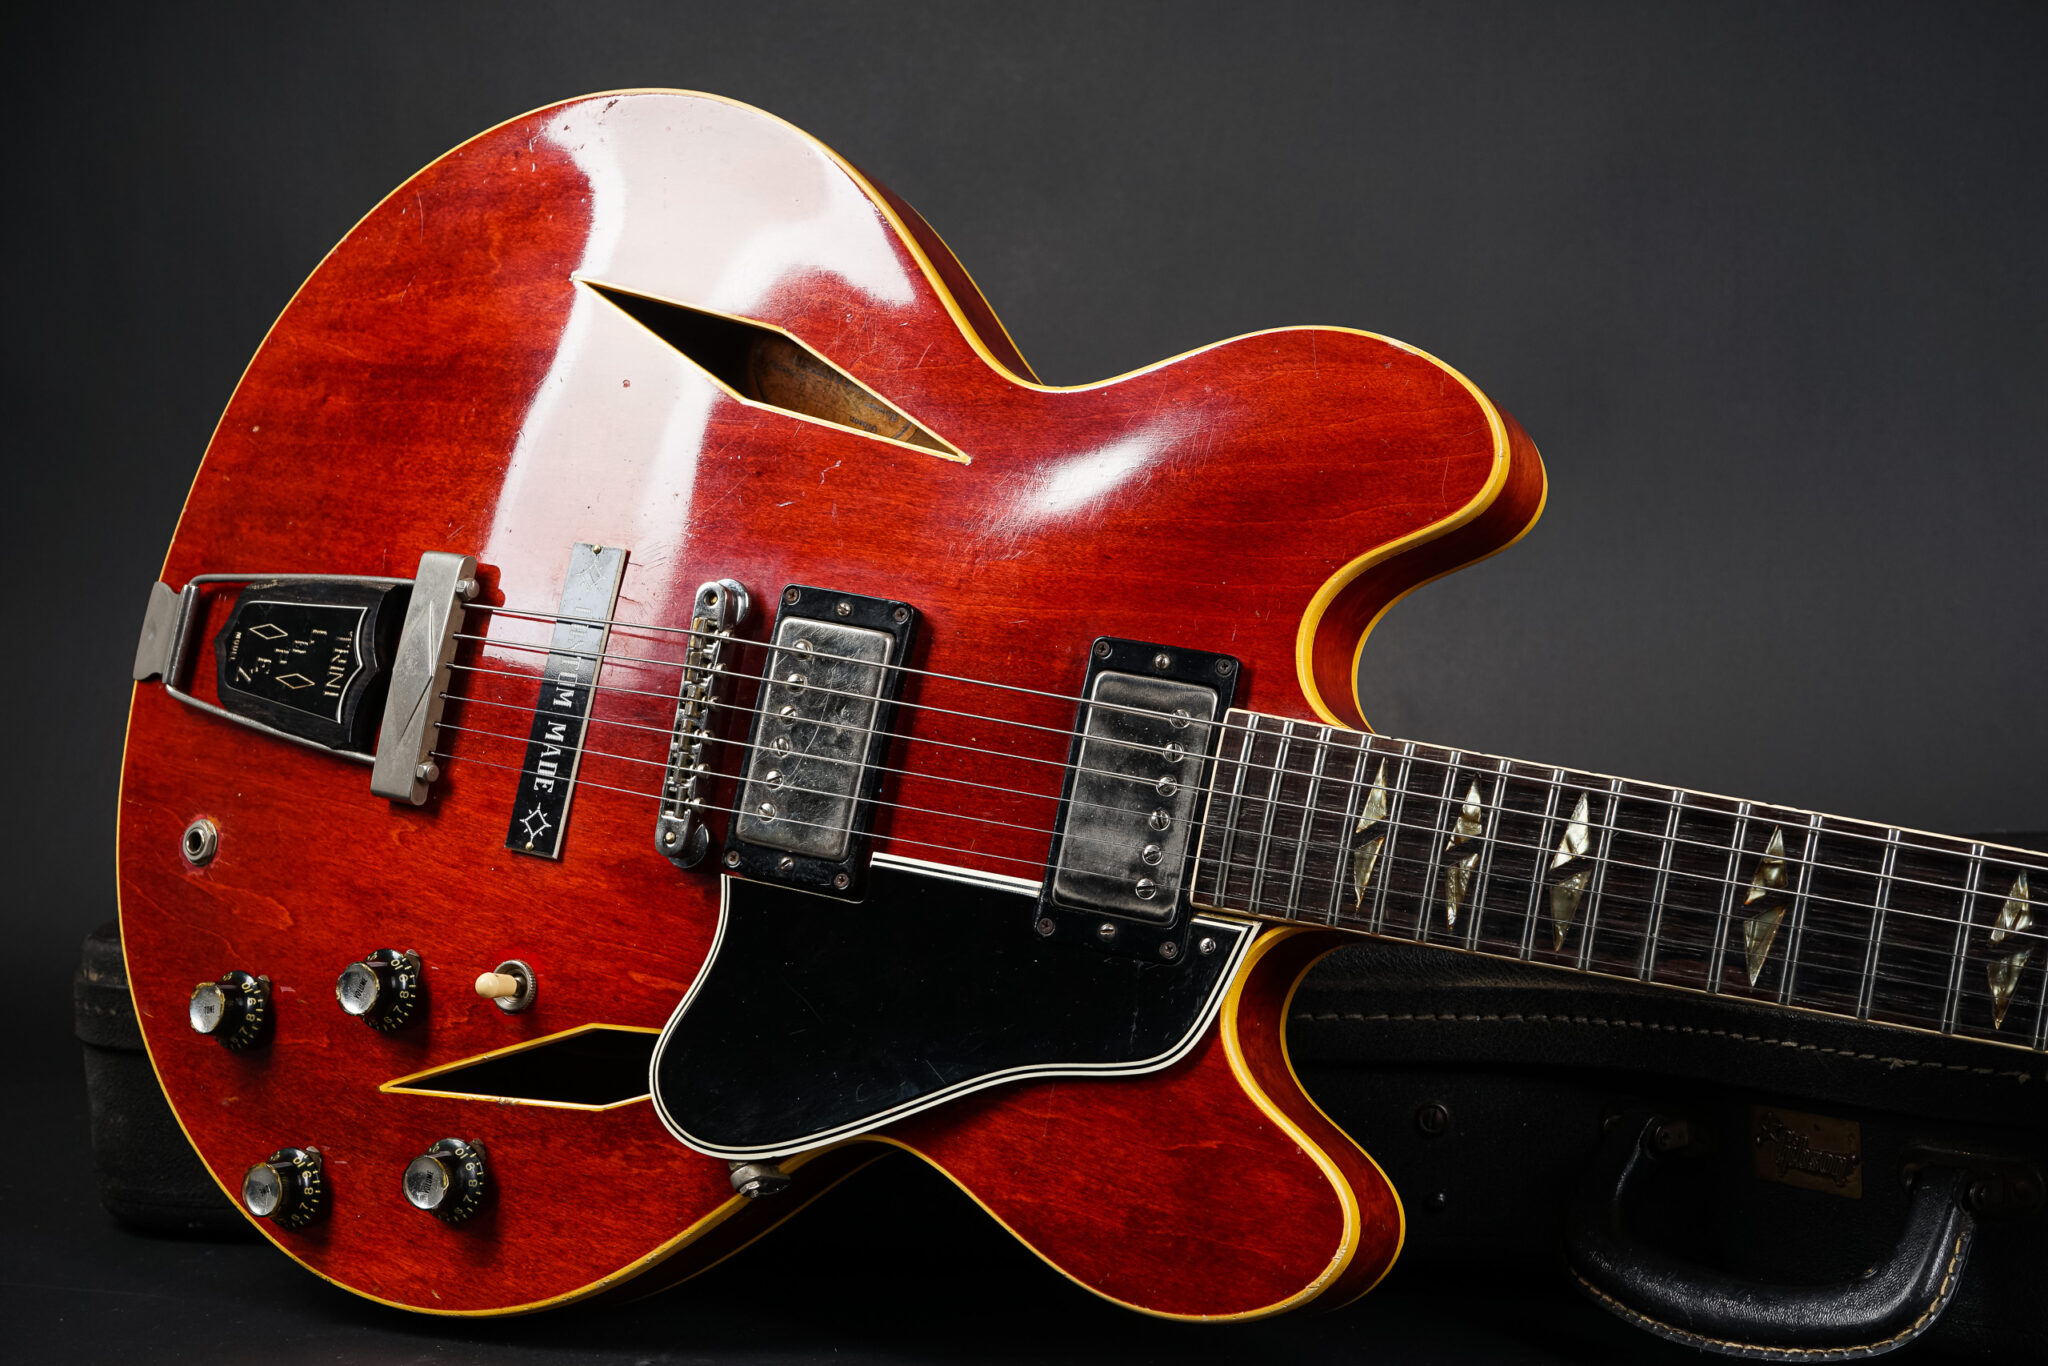 https://guitarpoint.de/app/uploads/products/1965-gibson-trini-lopez-standard-cherry/1965-Gibson-Trini-Lopez-Model-Cherry-8-2048x1366.jpg